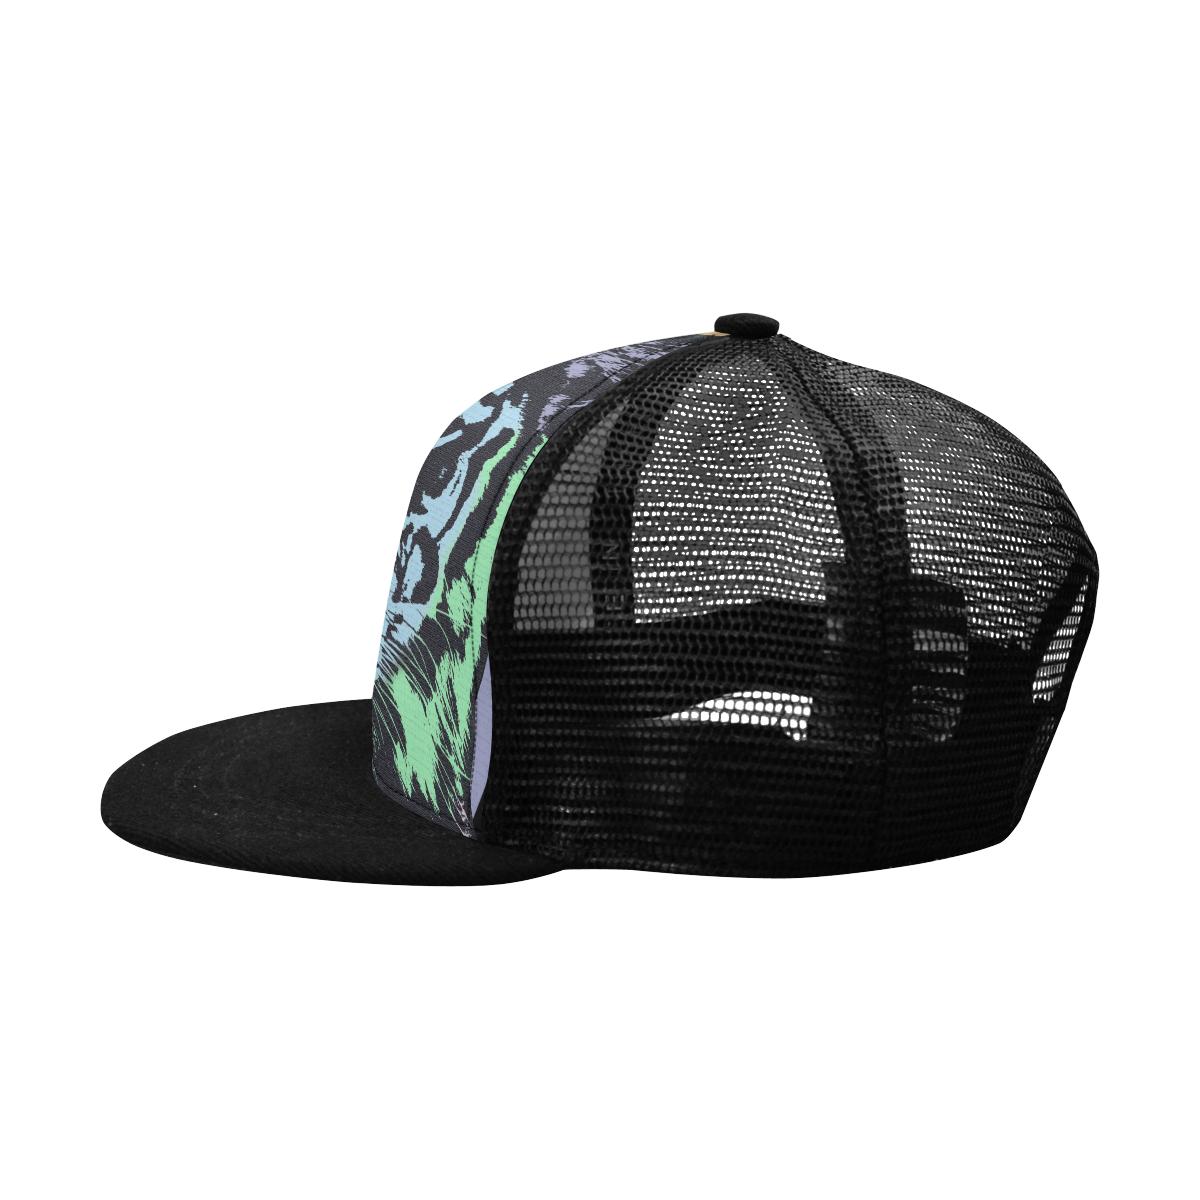 ART TIGER BASECAP Trucker Hat H (Front Panel Customization)